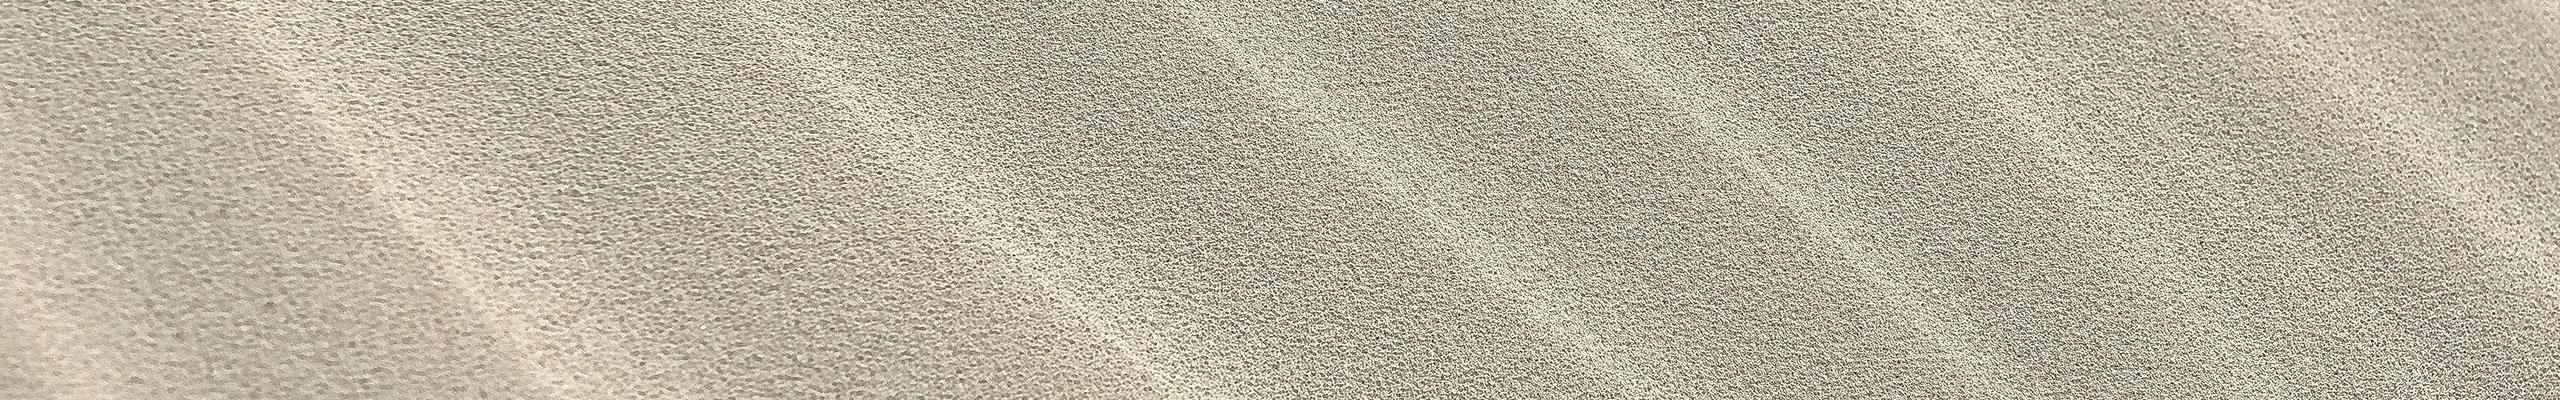 Sport su sabbia